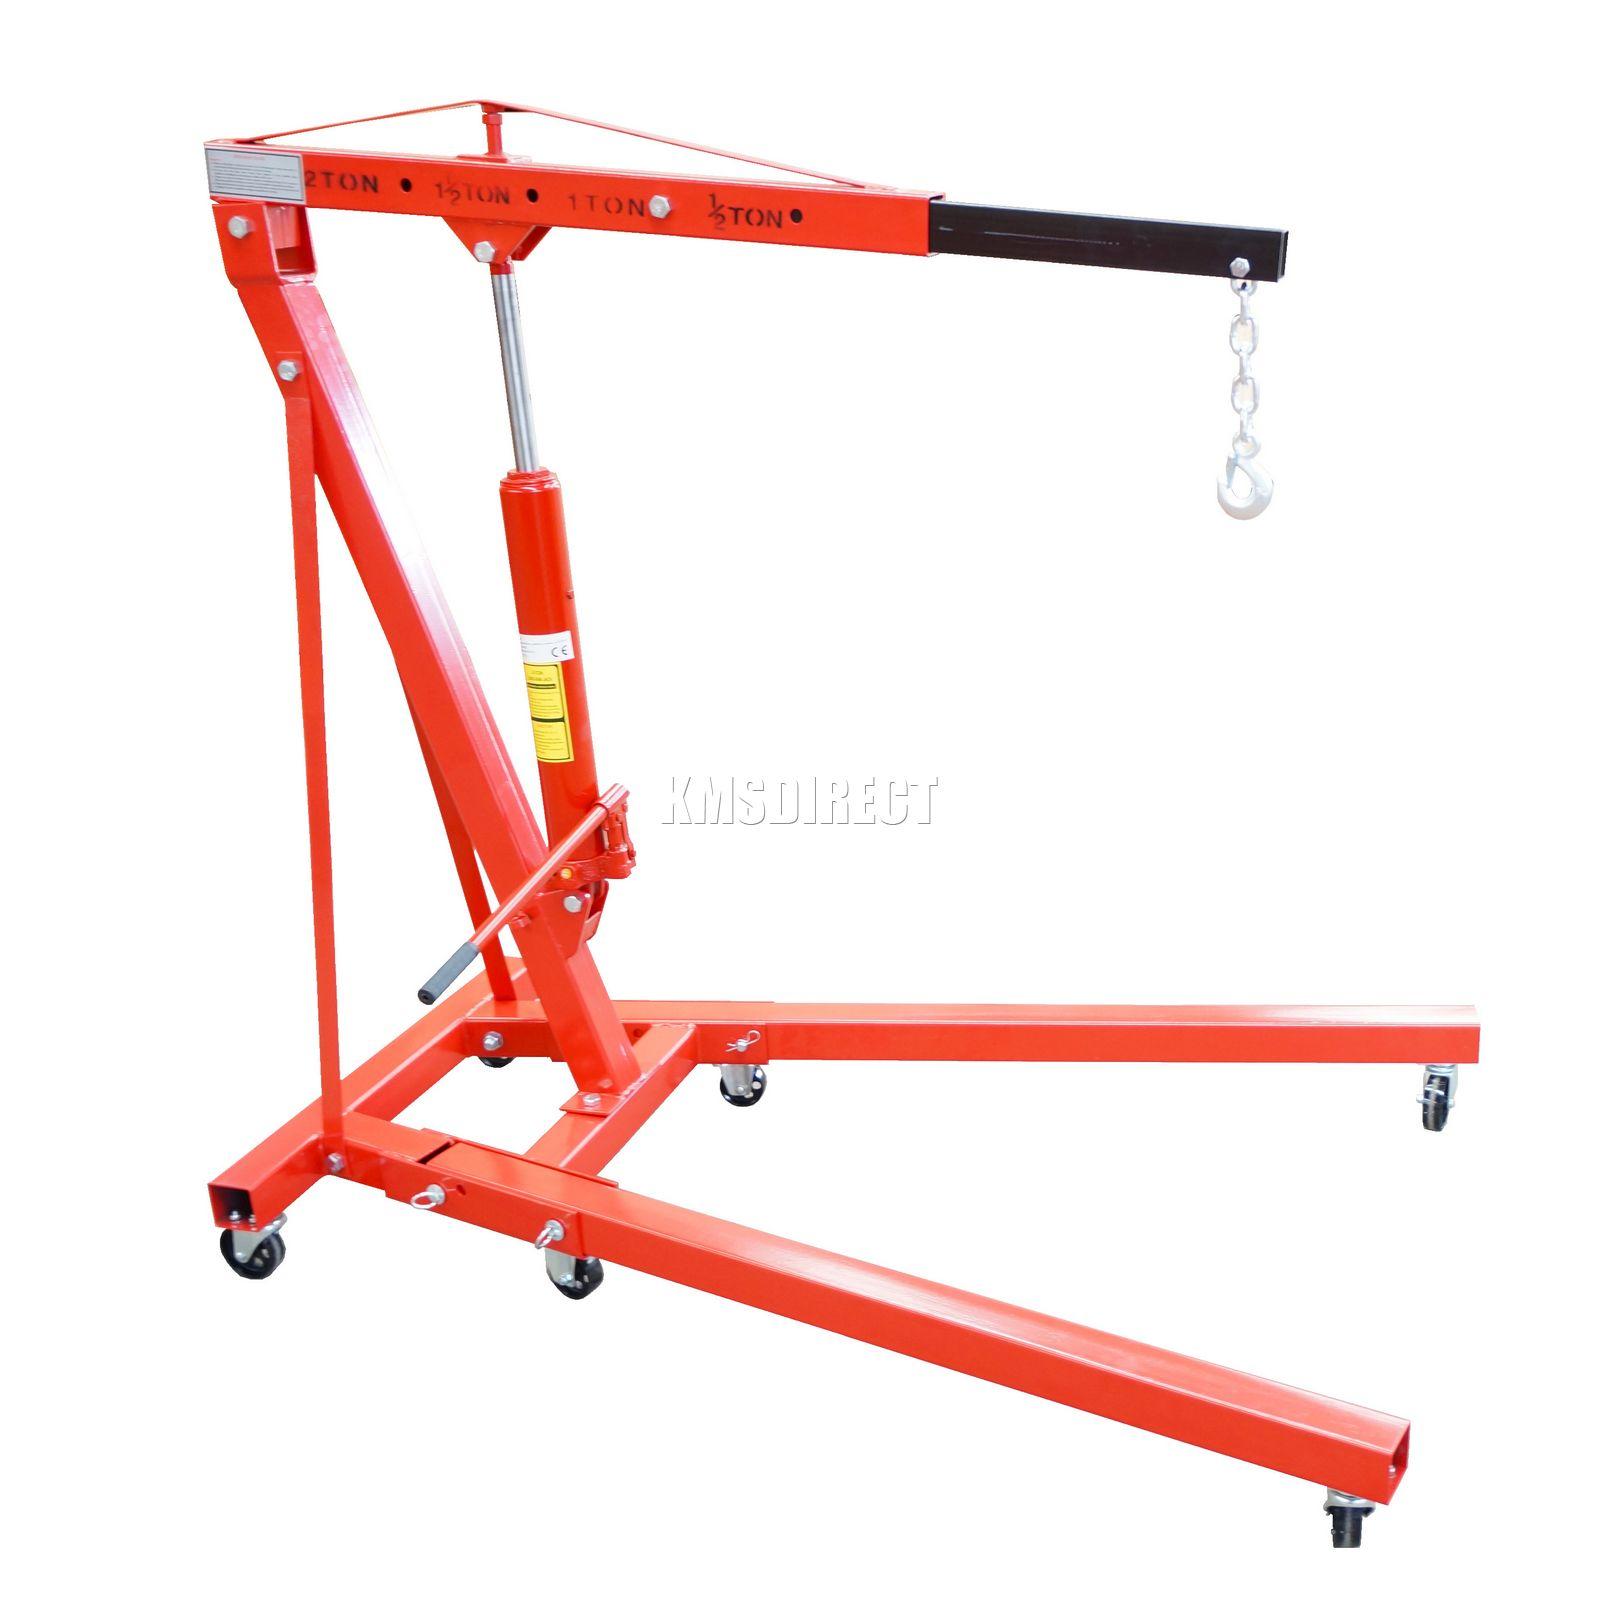 New Red 2 Ton Tonne Hydraulic Folding Engine Crane Stand